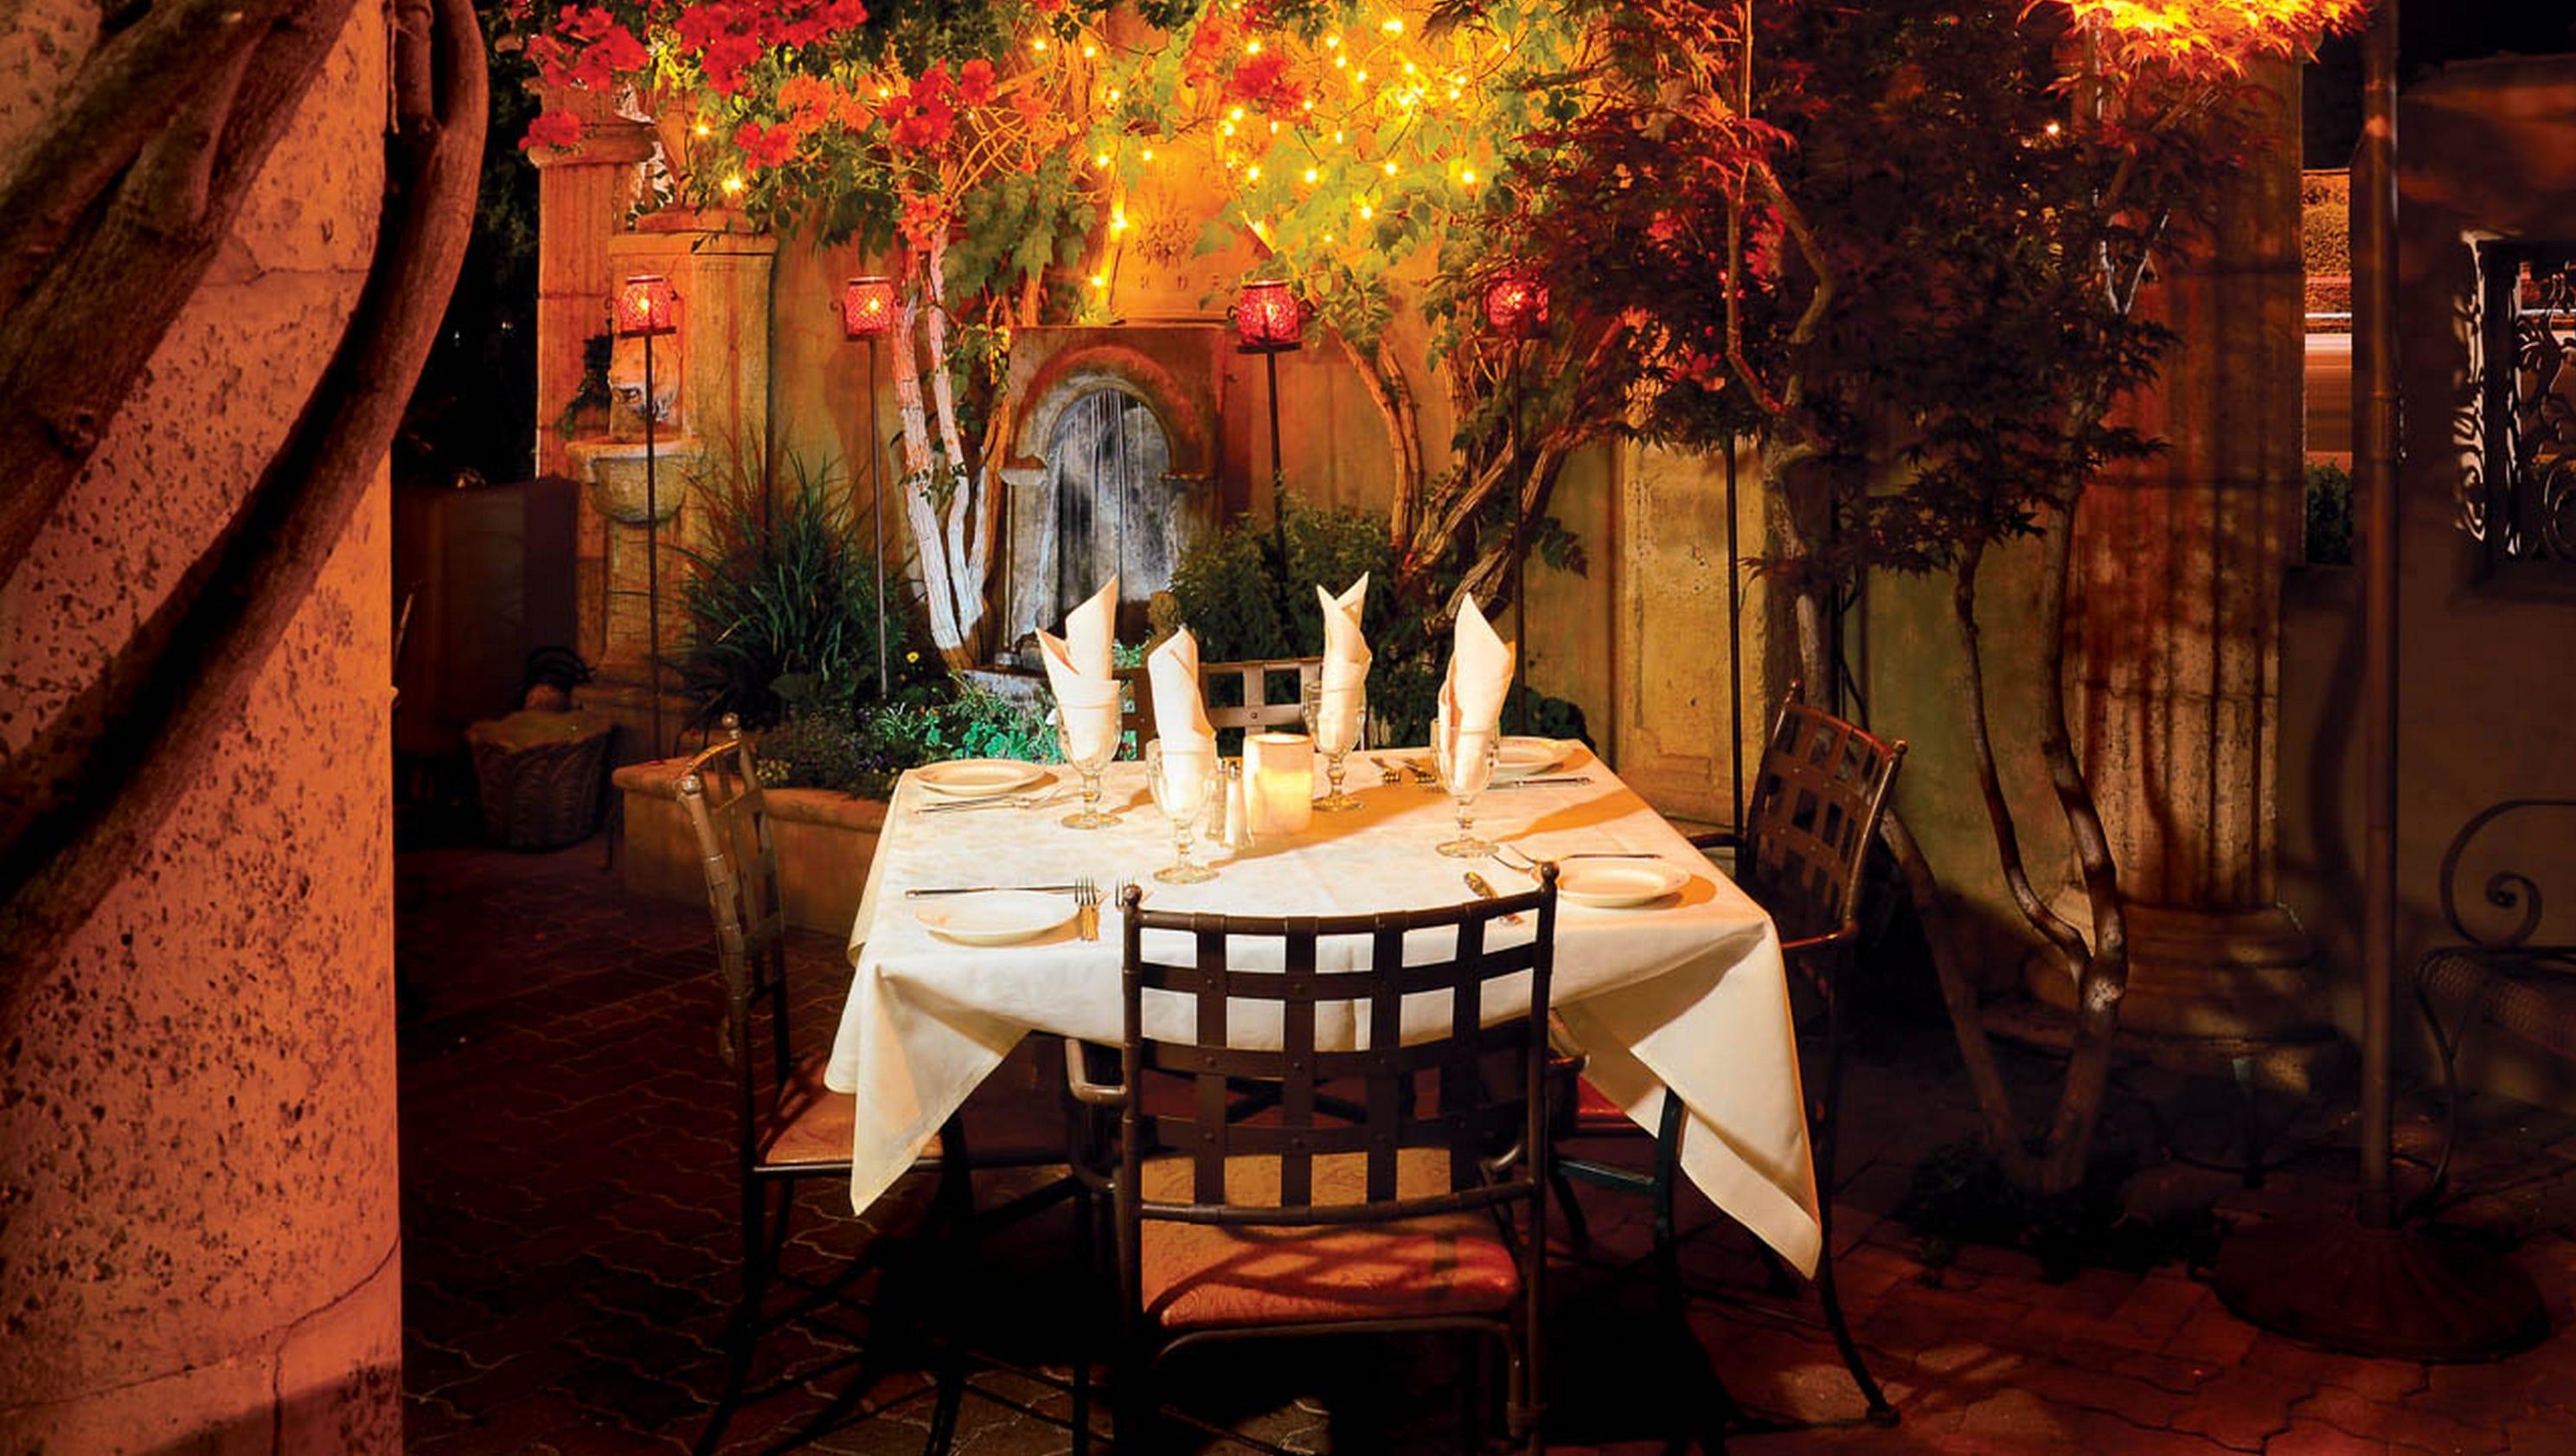 Sedona, Ariz., surprises with destination dining